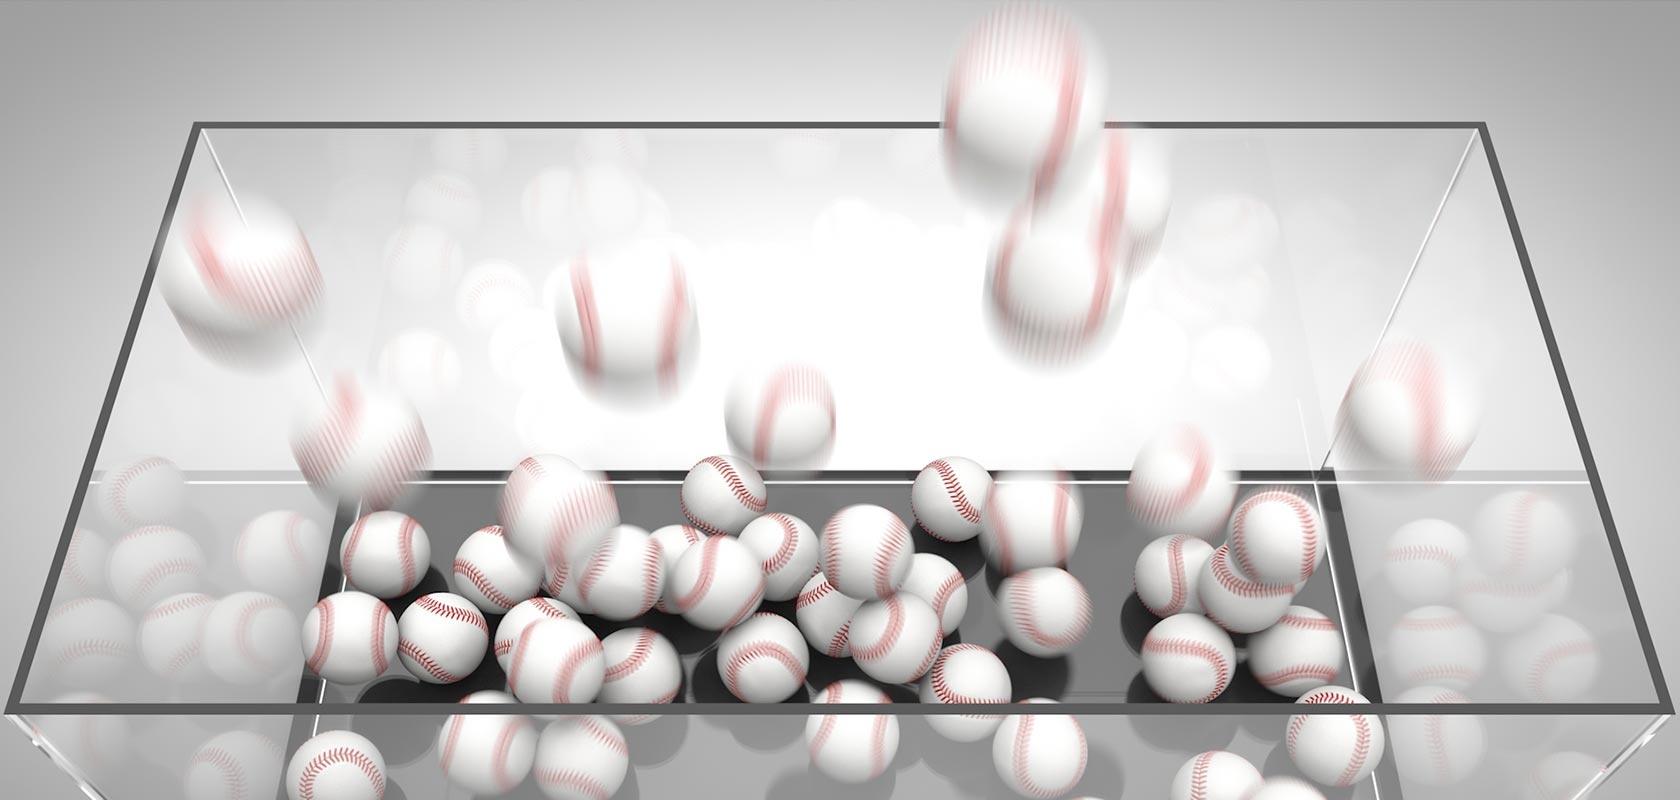 Dynamic Simulations in Cinema 4D